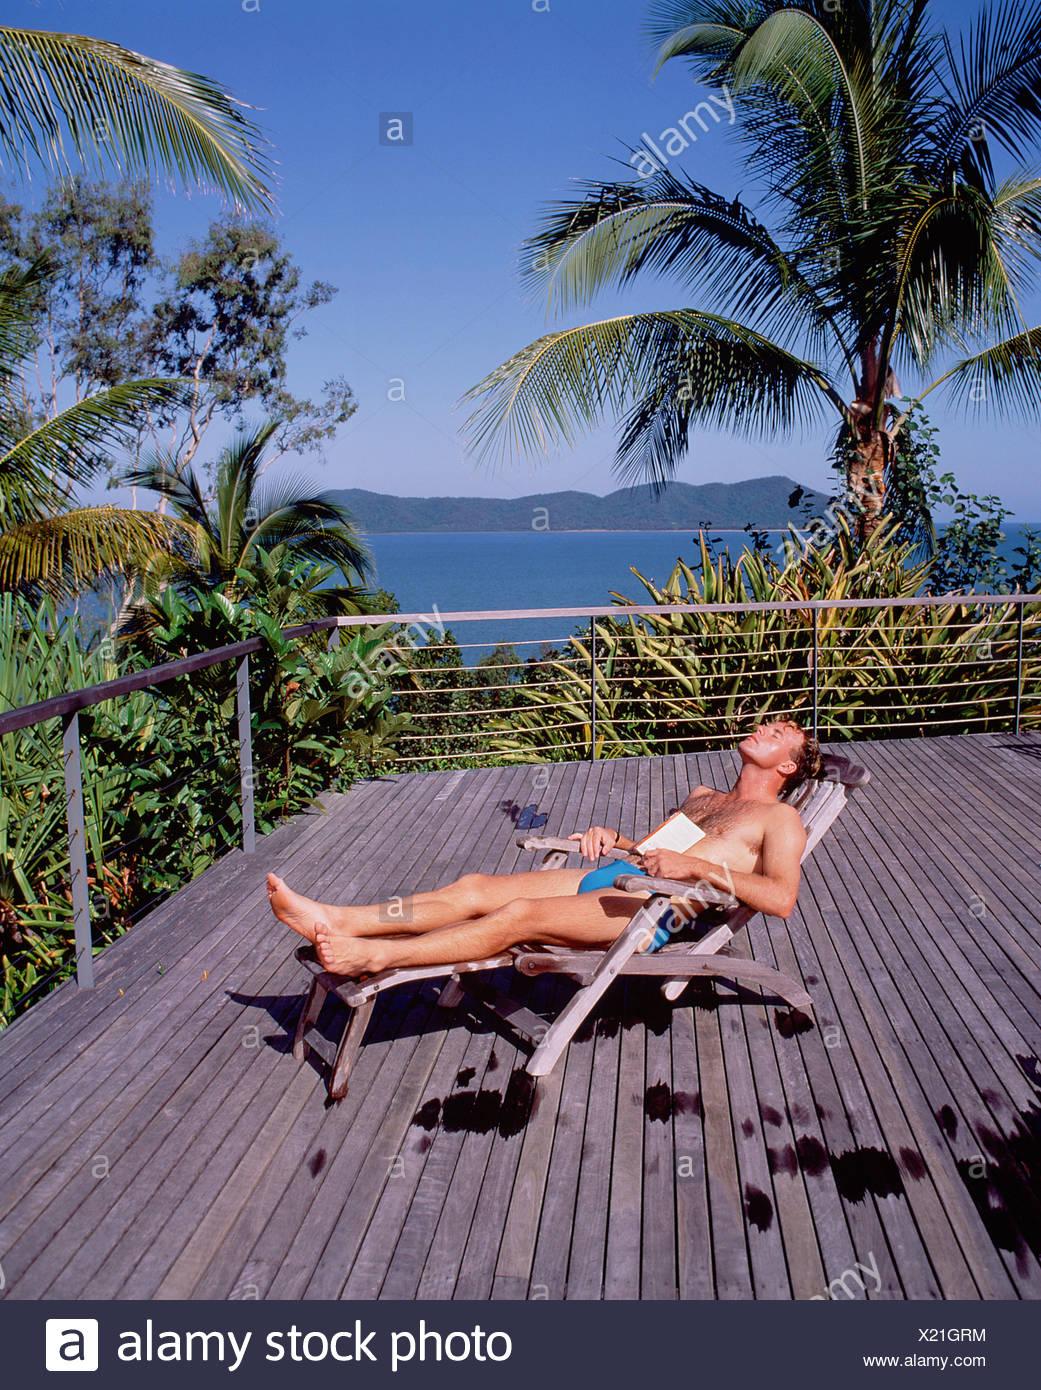 Young Man In Swimsuit On Recliner Chair In Terrace Deck. Queensland.  Australia.